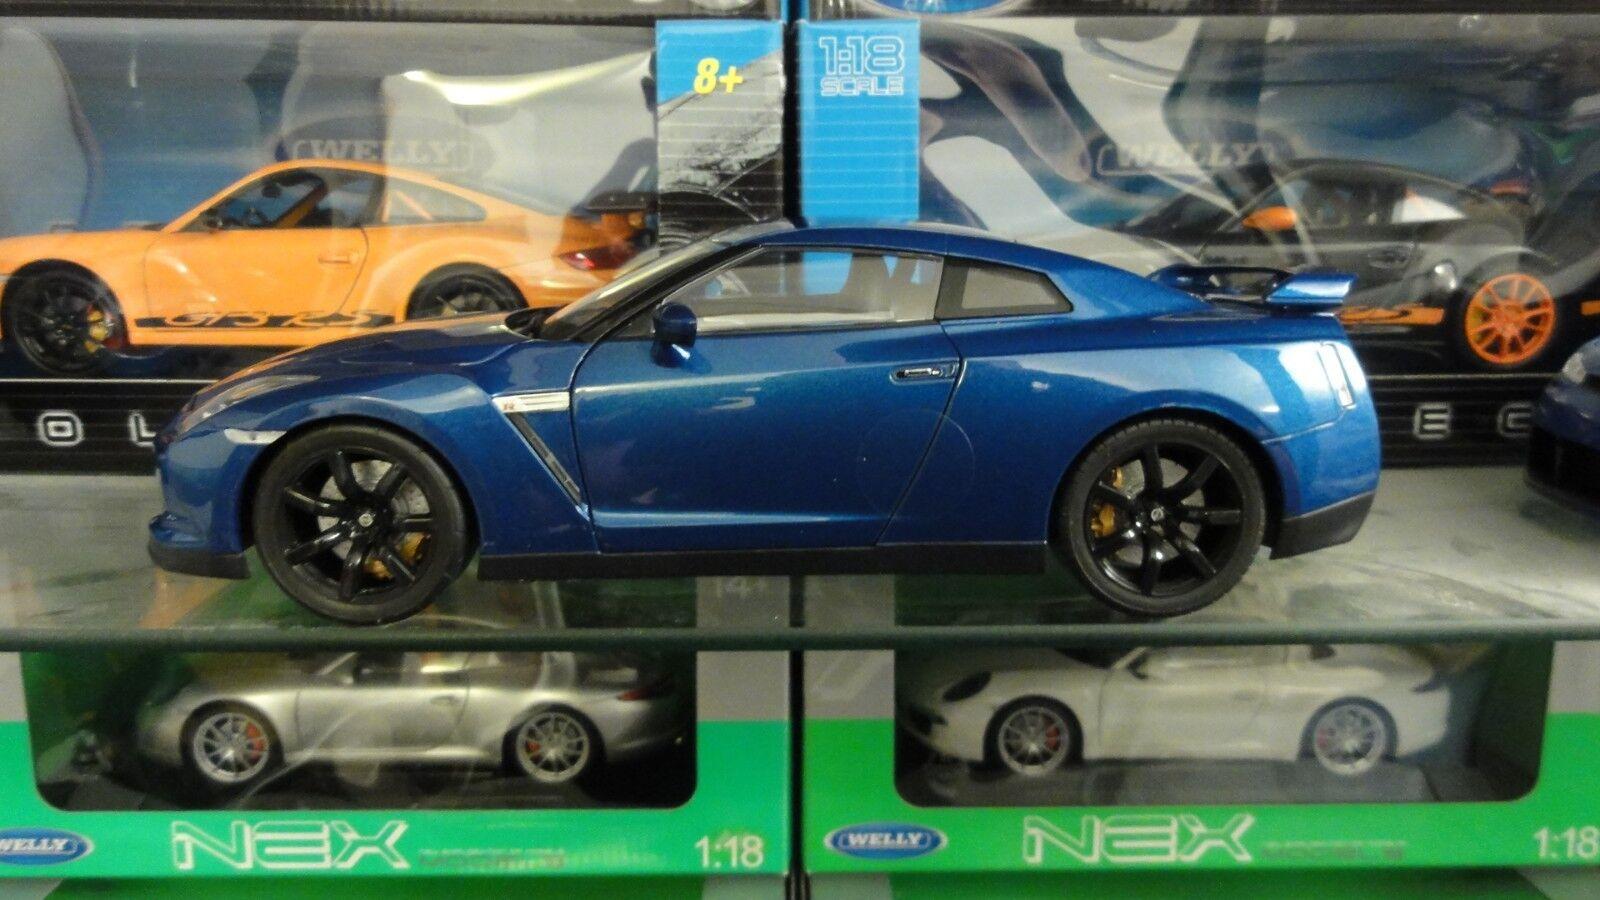 Nissan GTR R35 Bleu 1 18 - NOREV